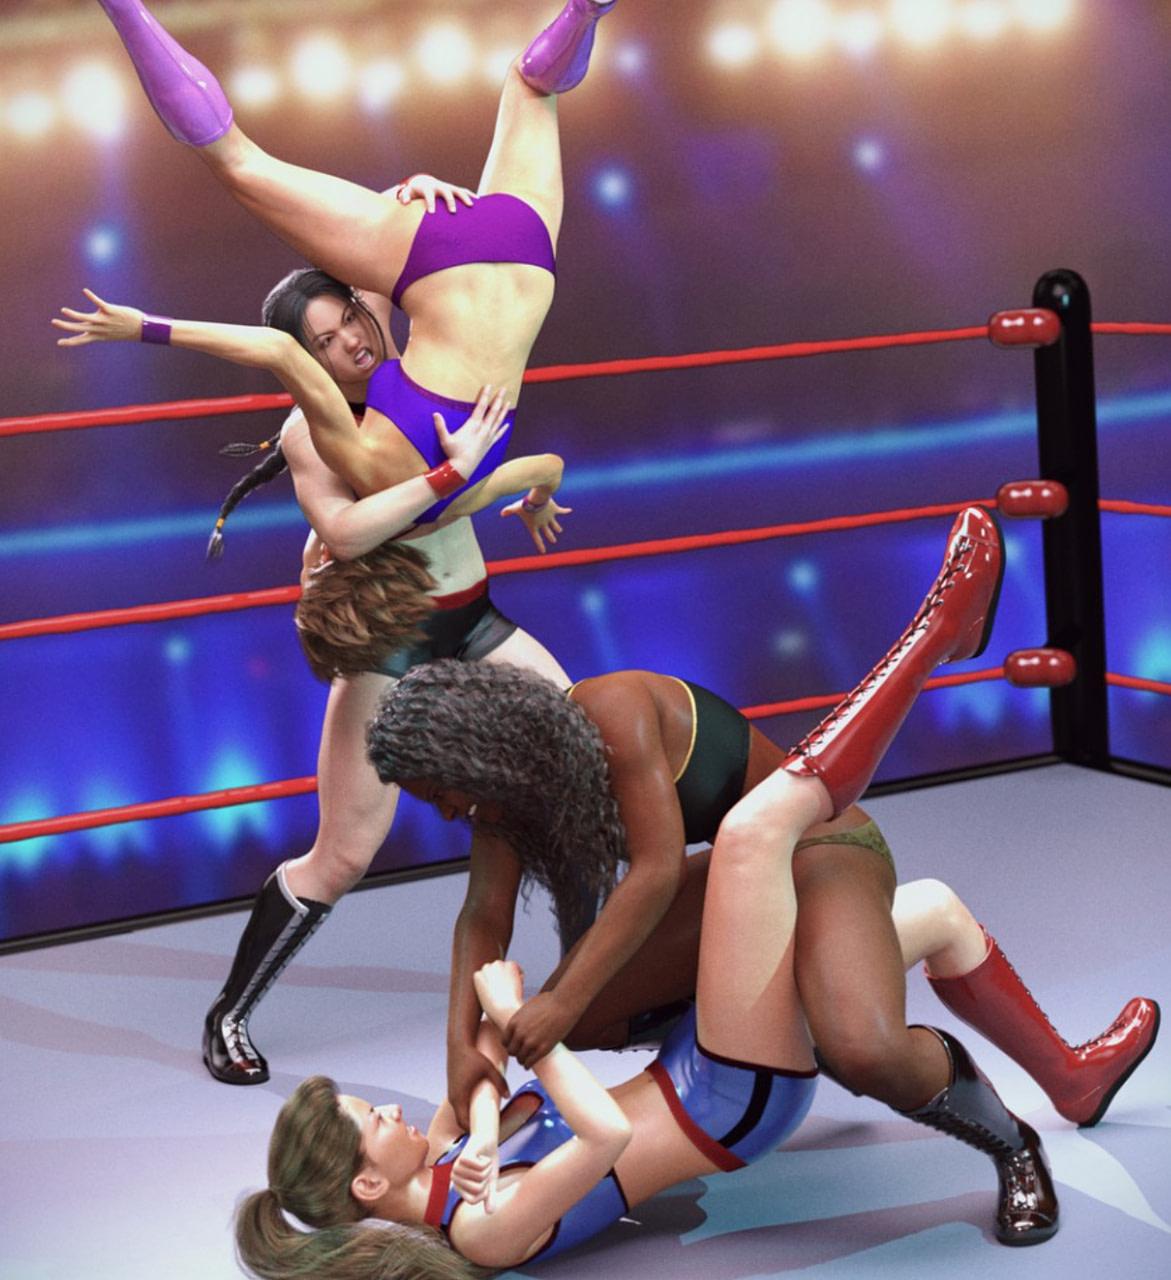 daz female wrestling poses